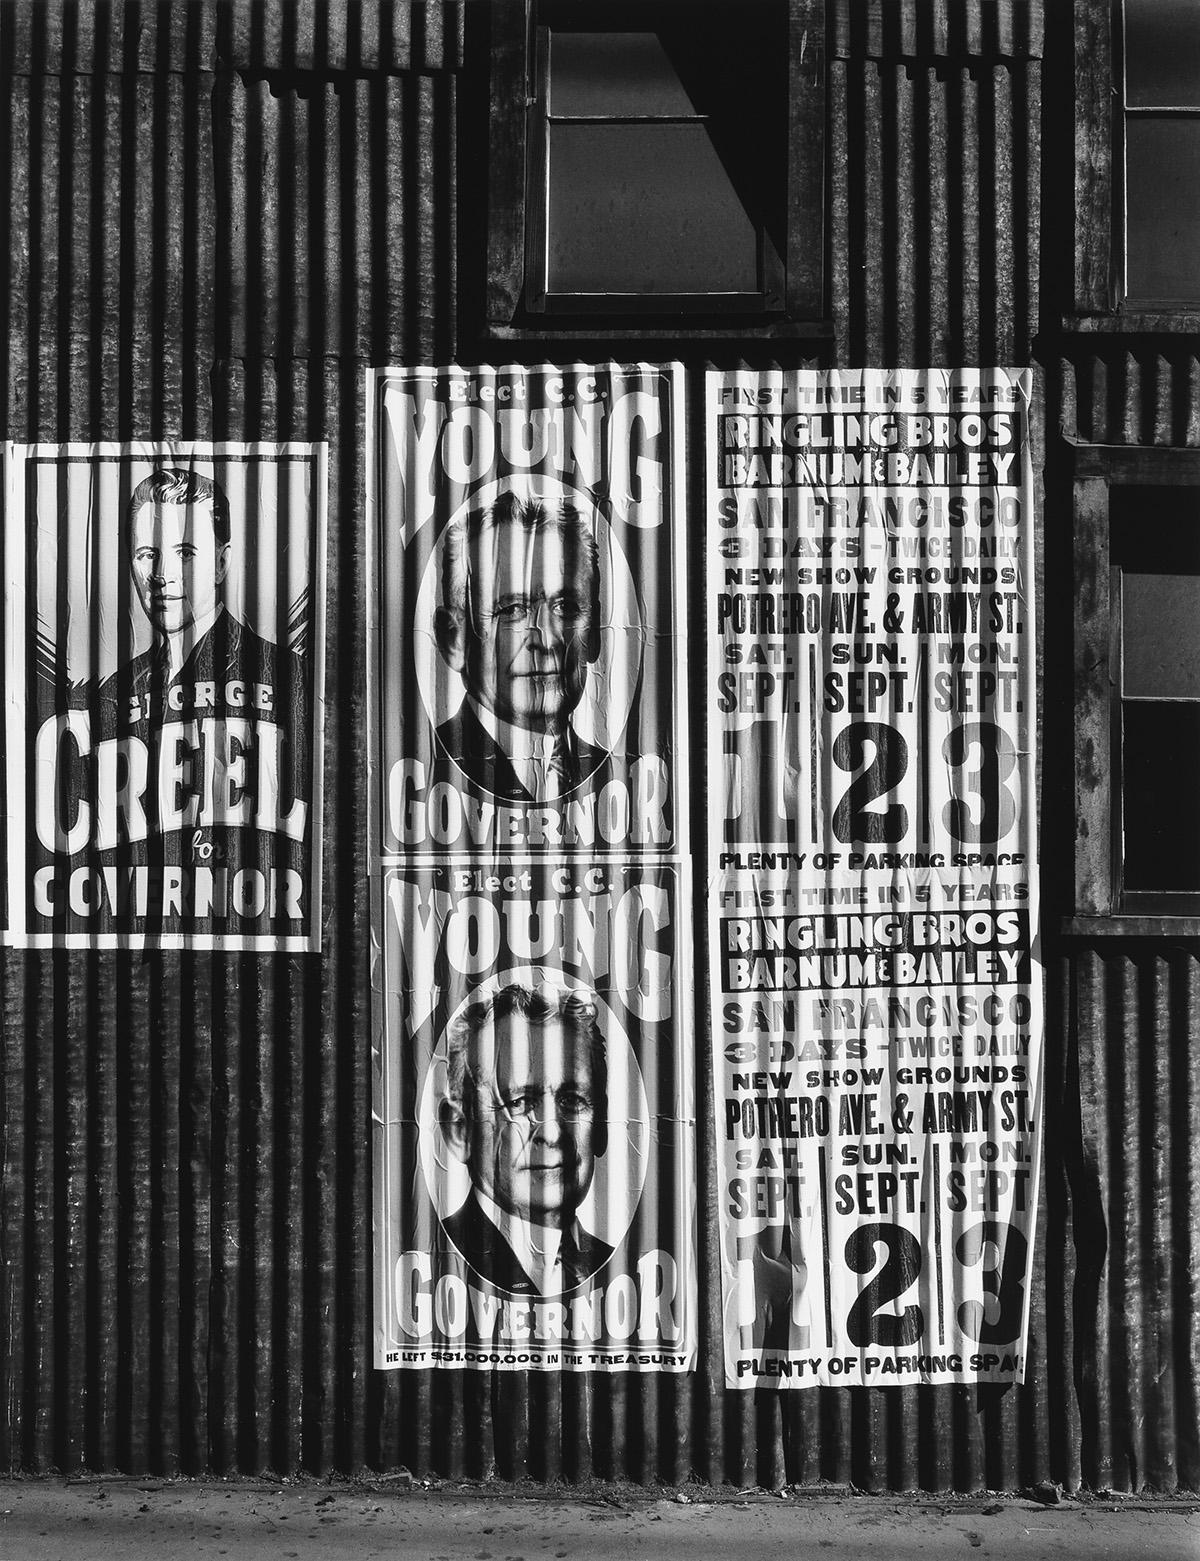 ANSEL ADAMS (1902-1984) Political Signs and Circus Posters, San Francisco.